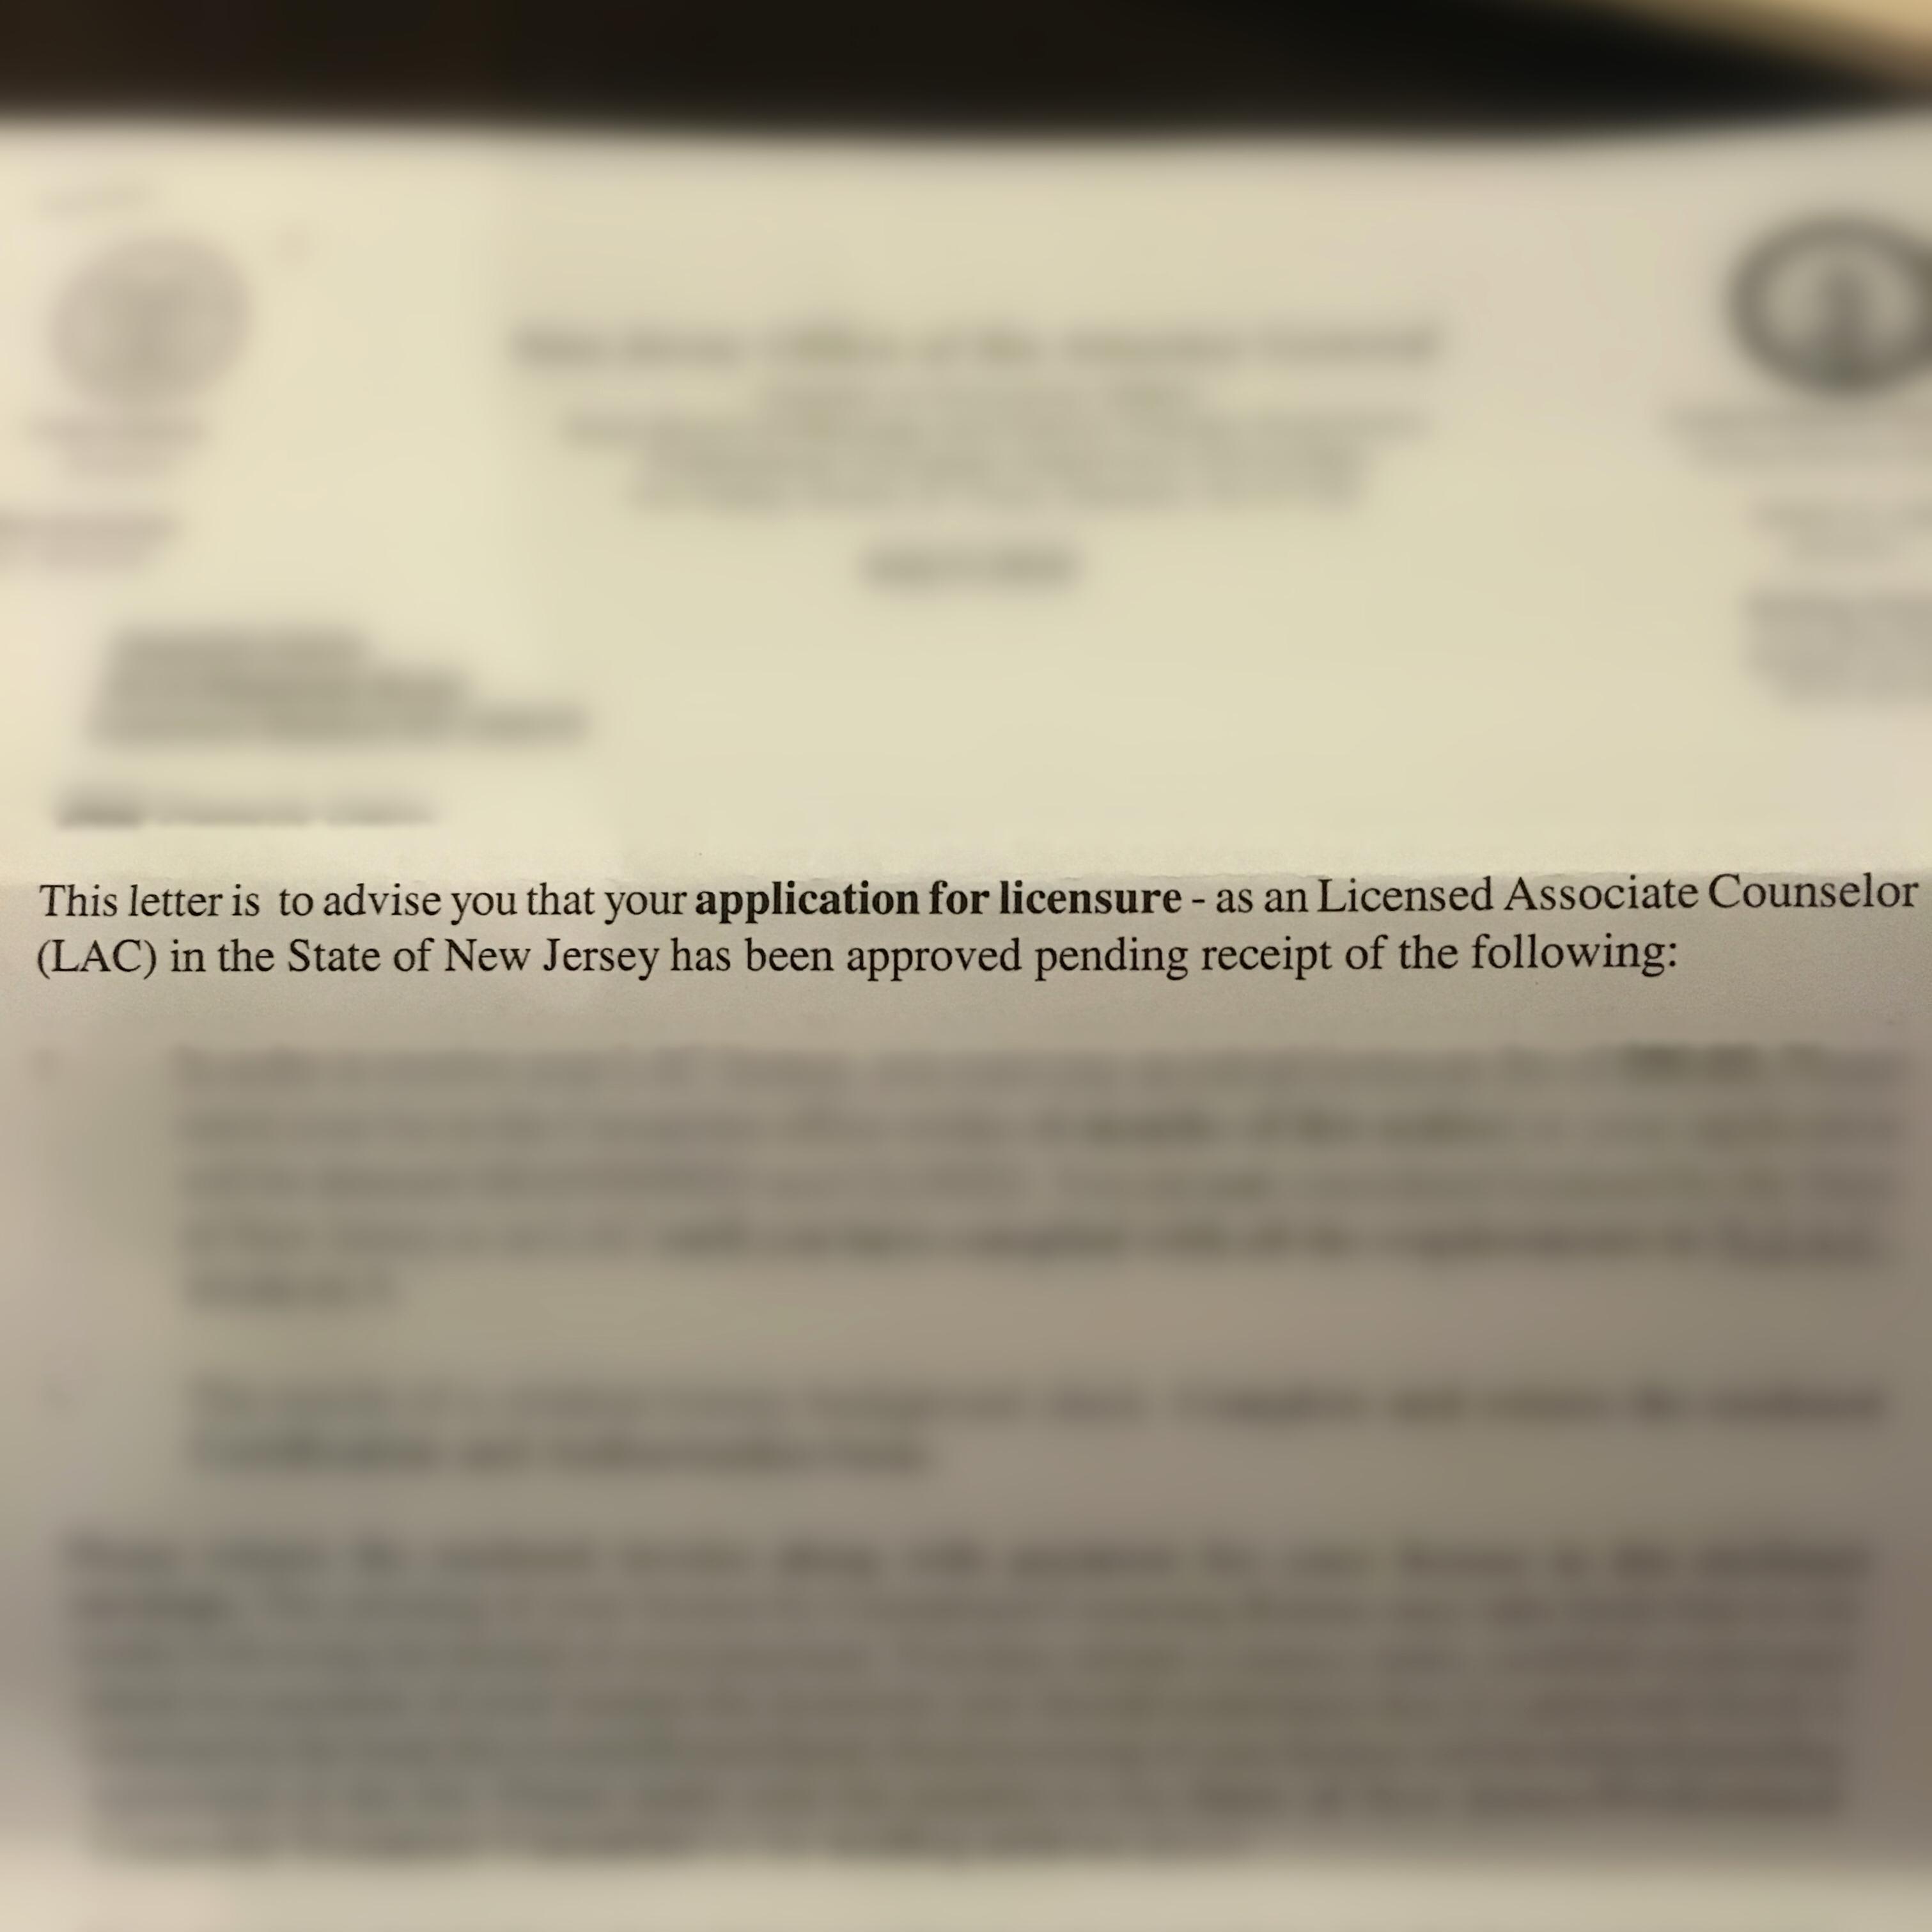 licenseapproval